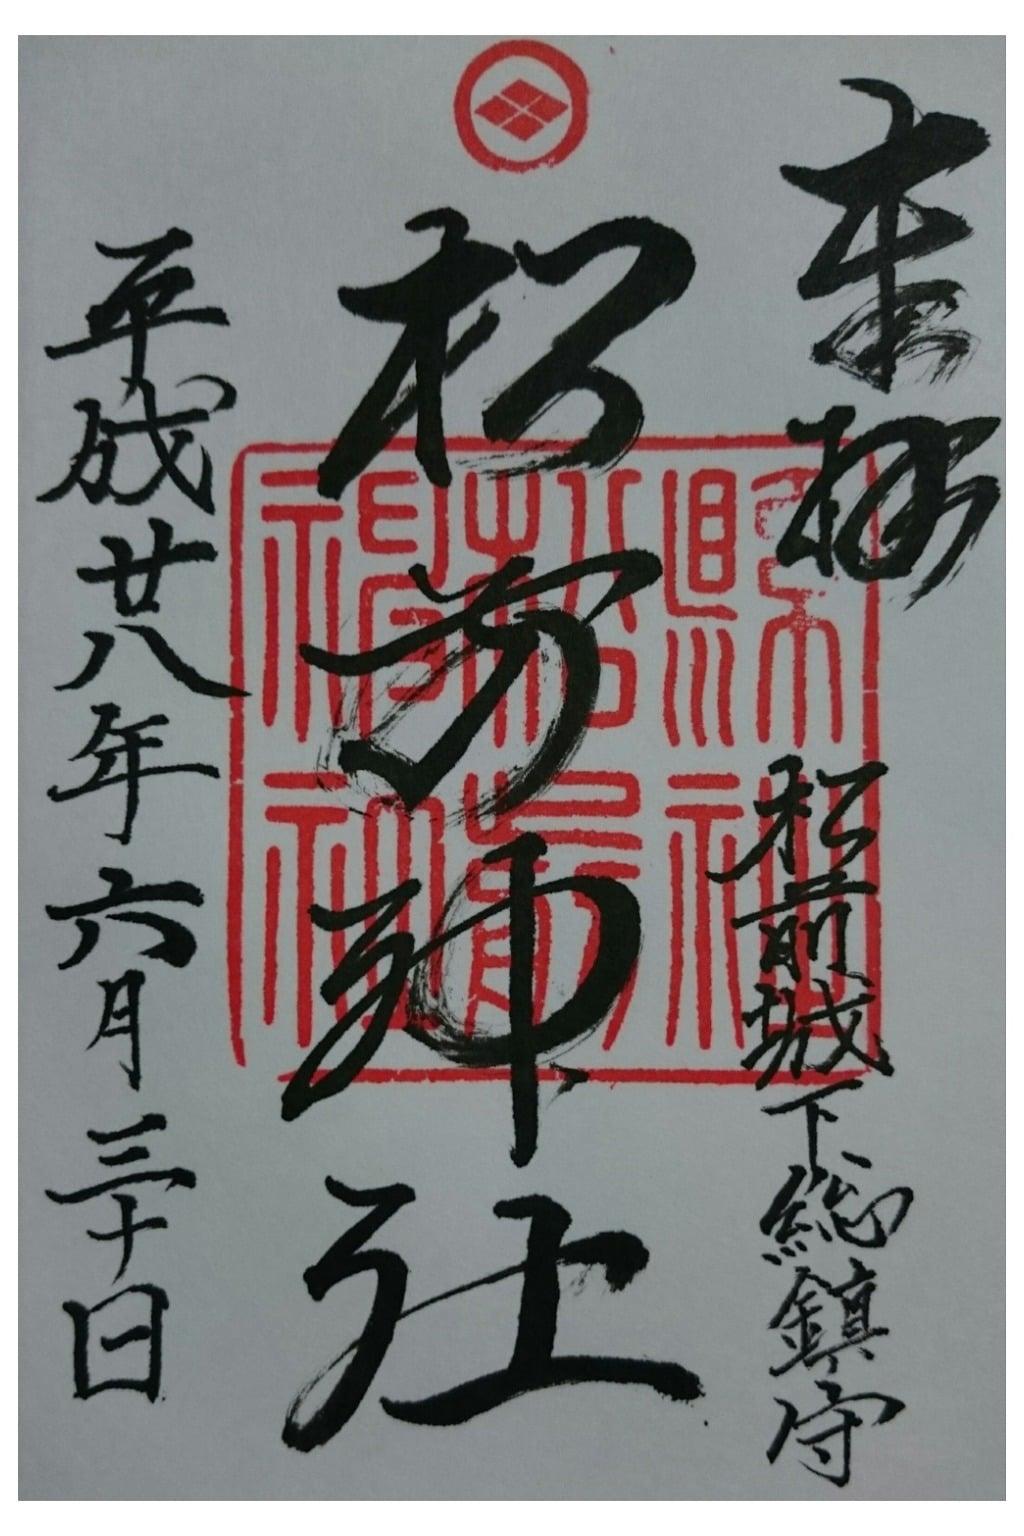 松前神社の御朱印